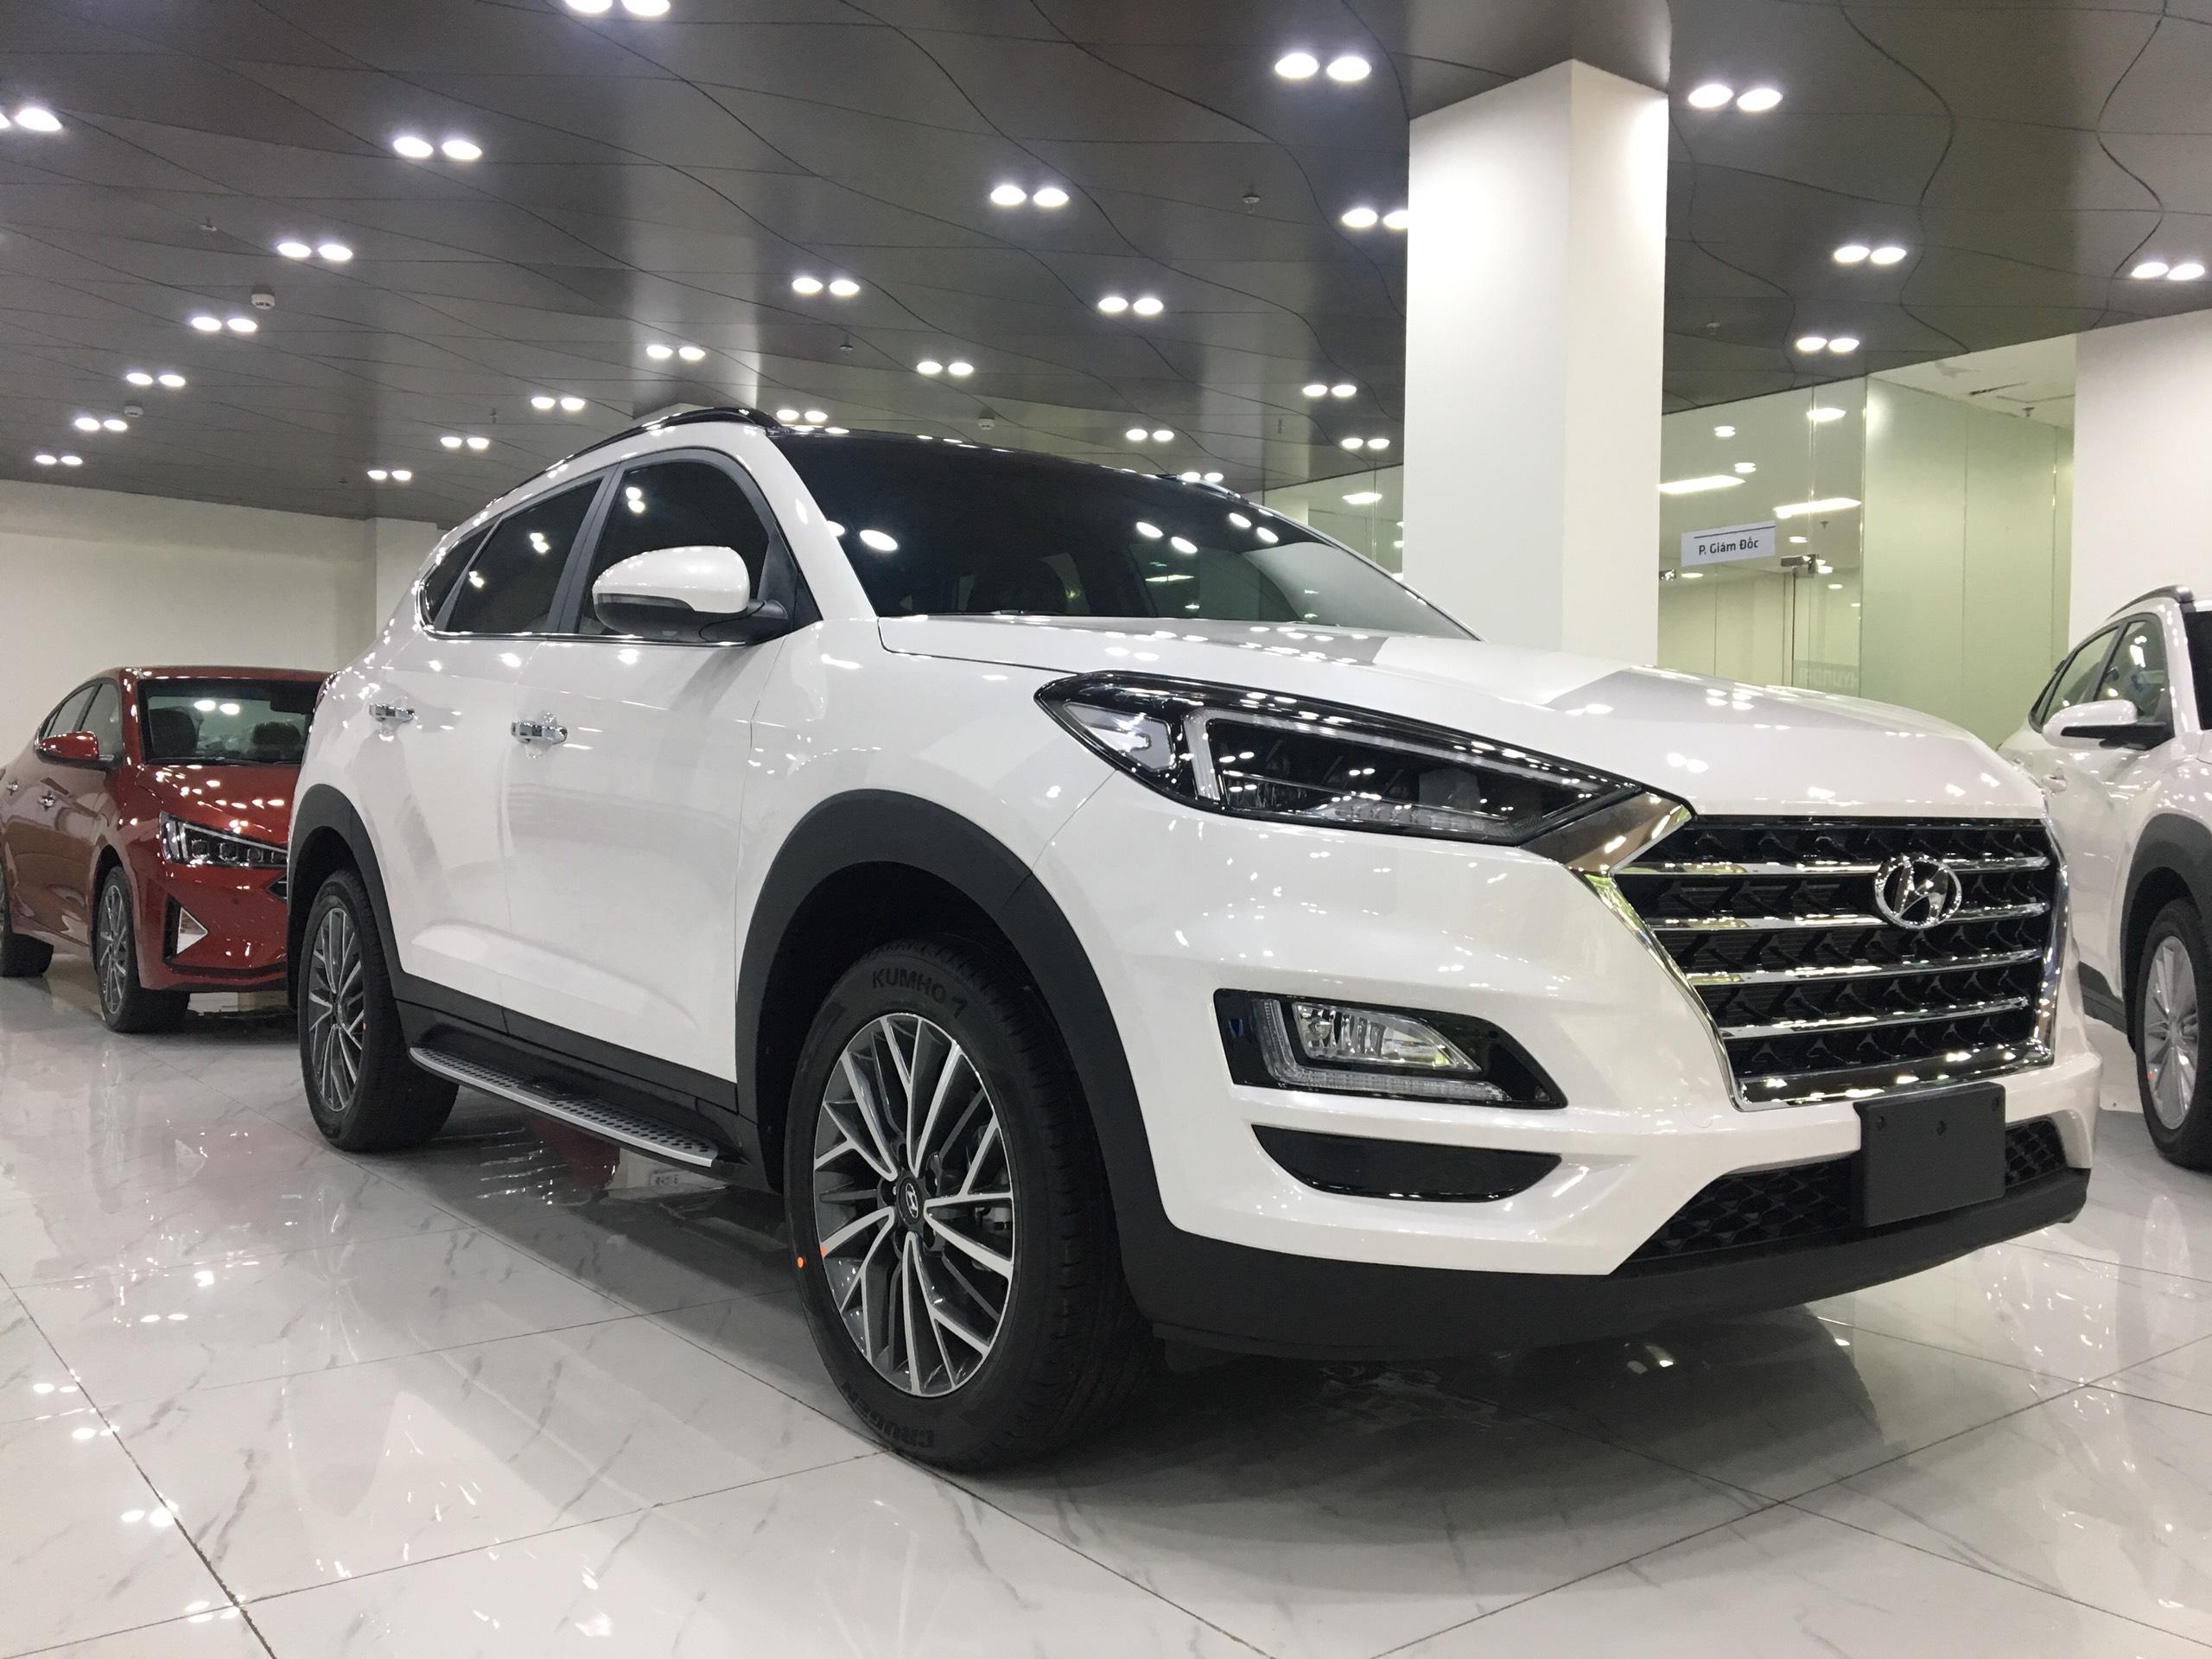 Hyundai Tucson 2.0 AT Đặc biệt 2019 (2)